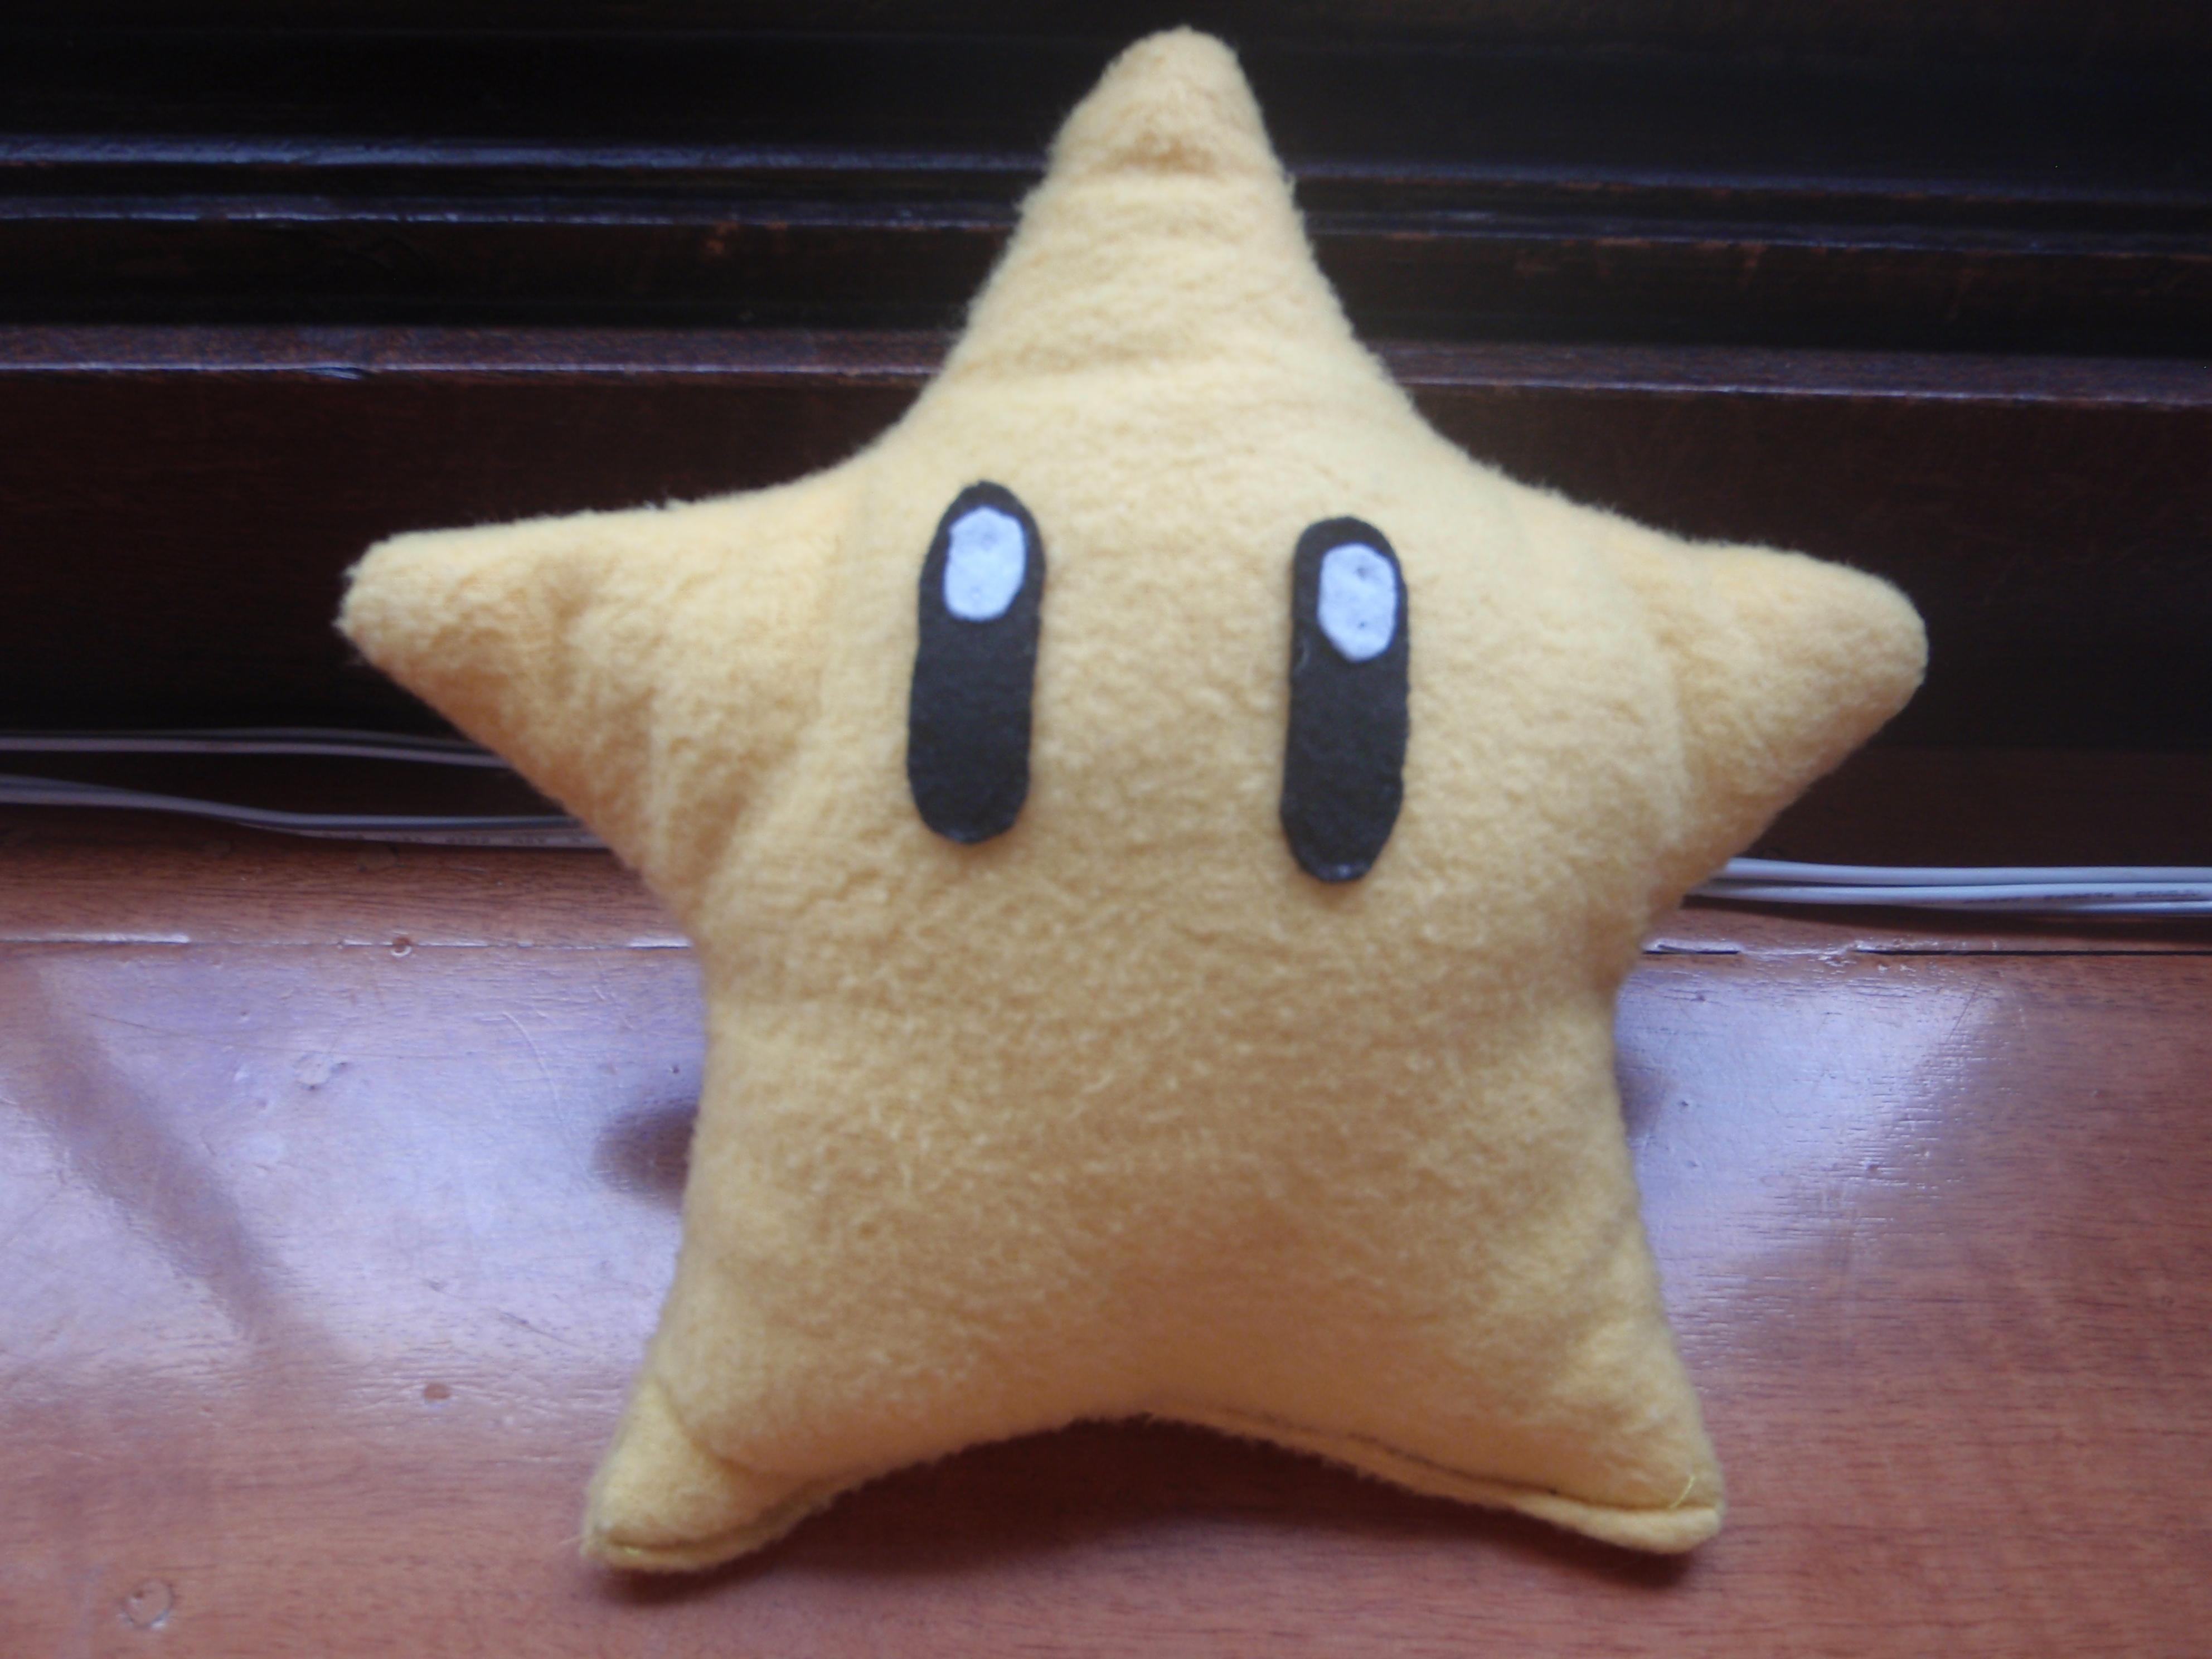 How to make a Mario power star plush